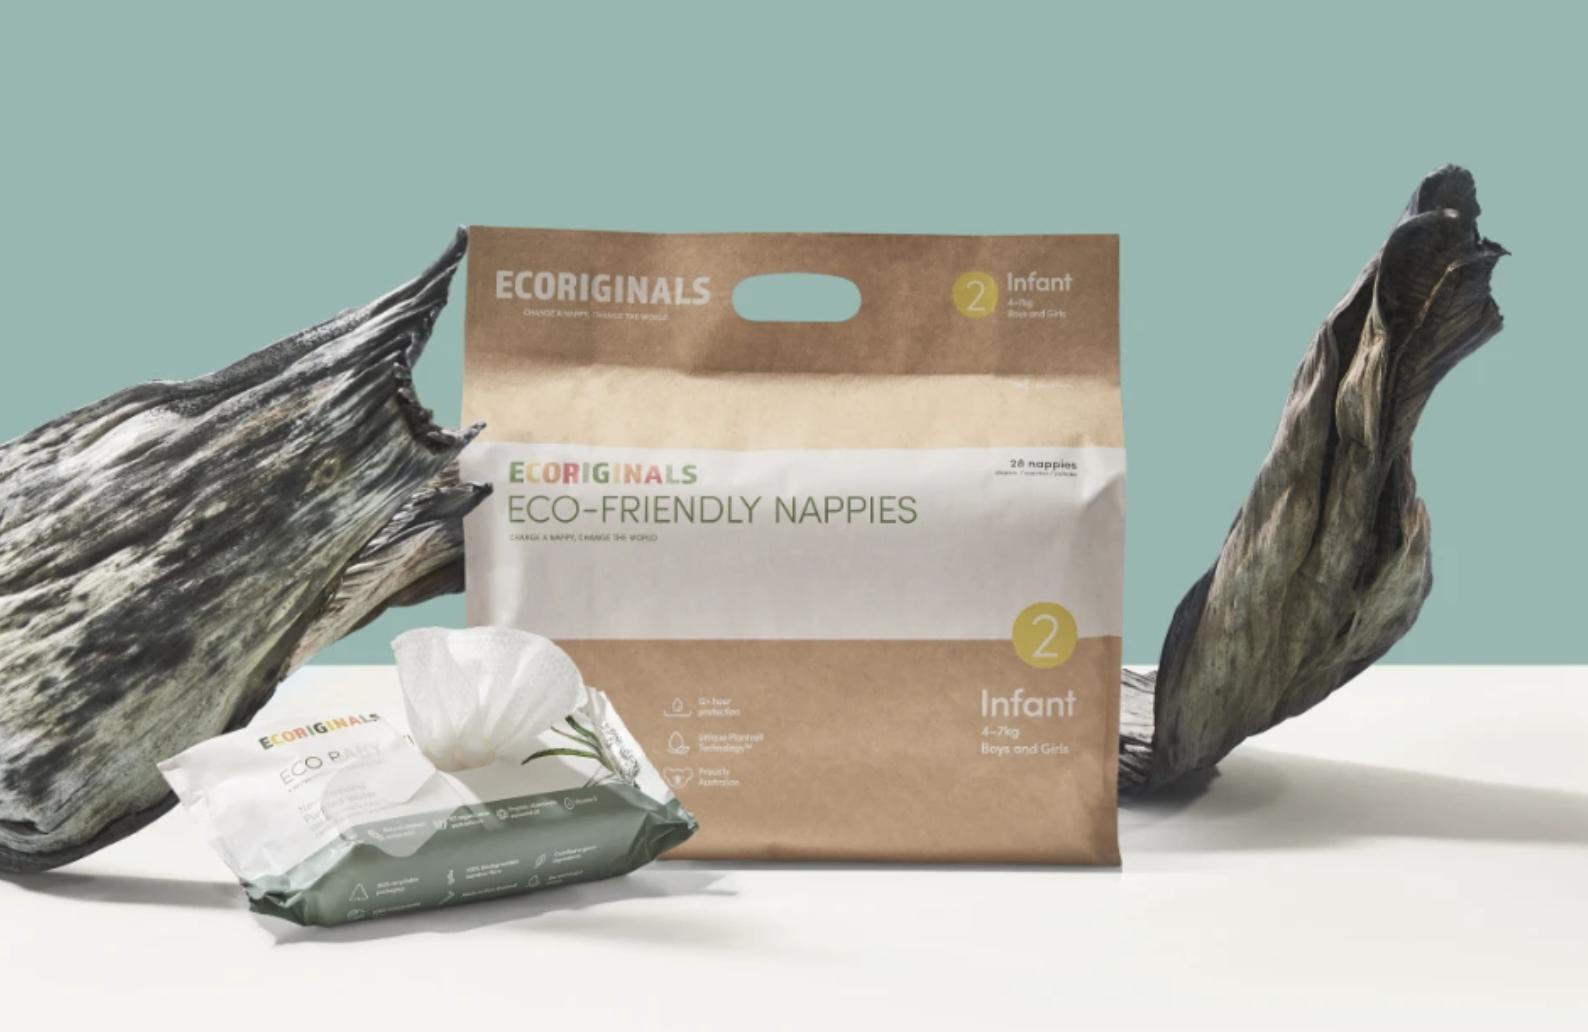 EcoOriginals - 6 Packs of Nappies